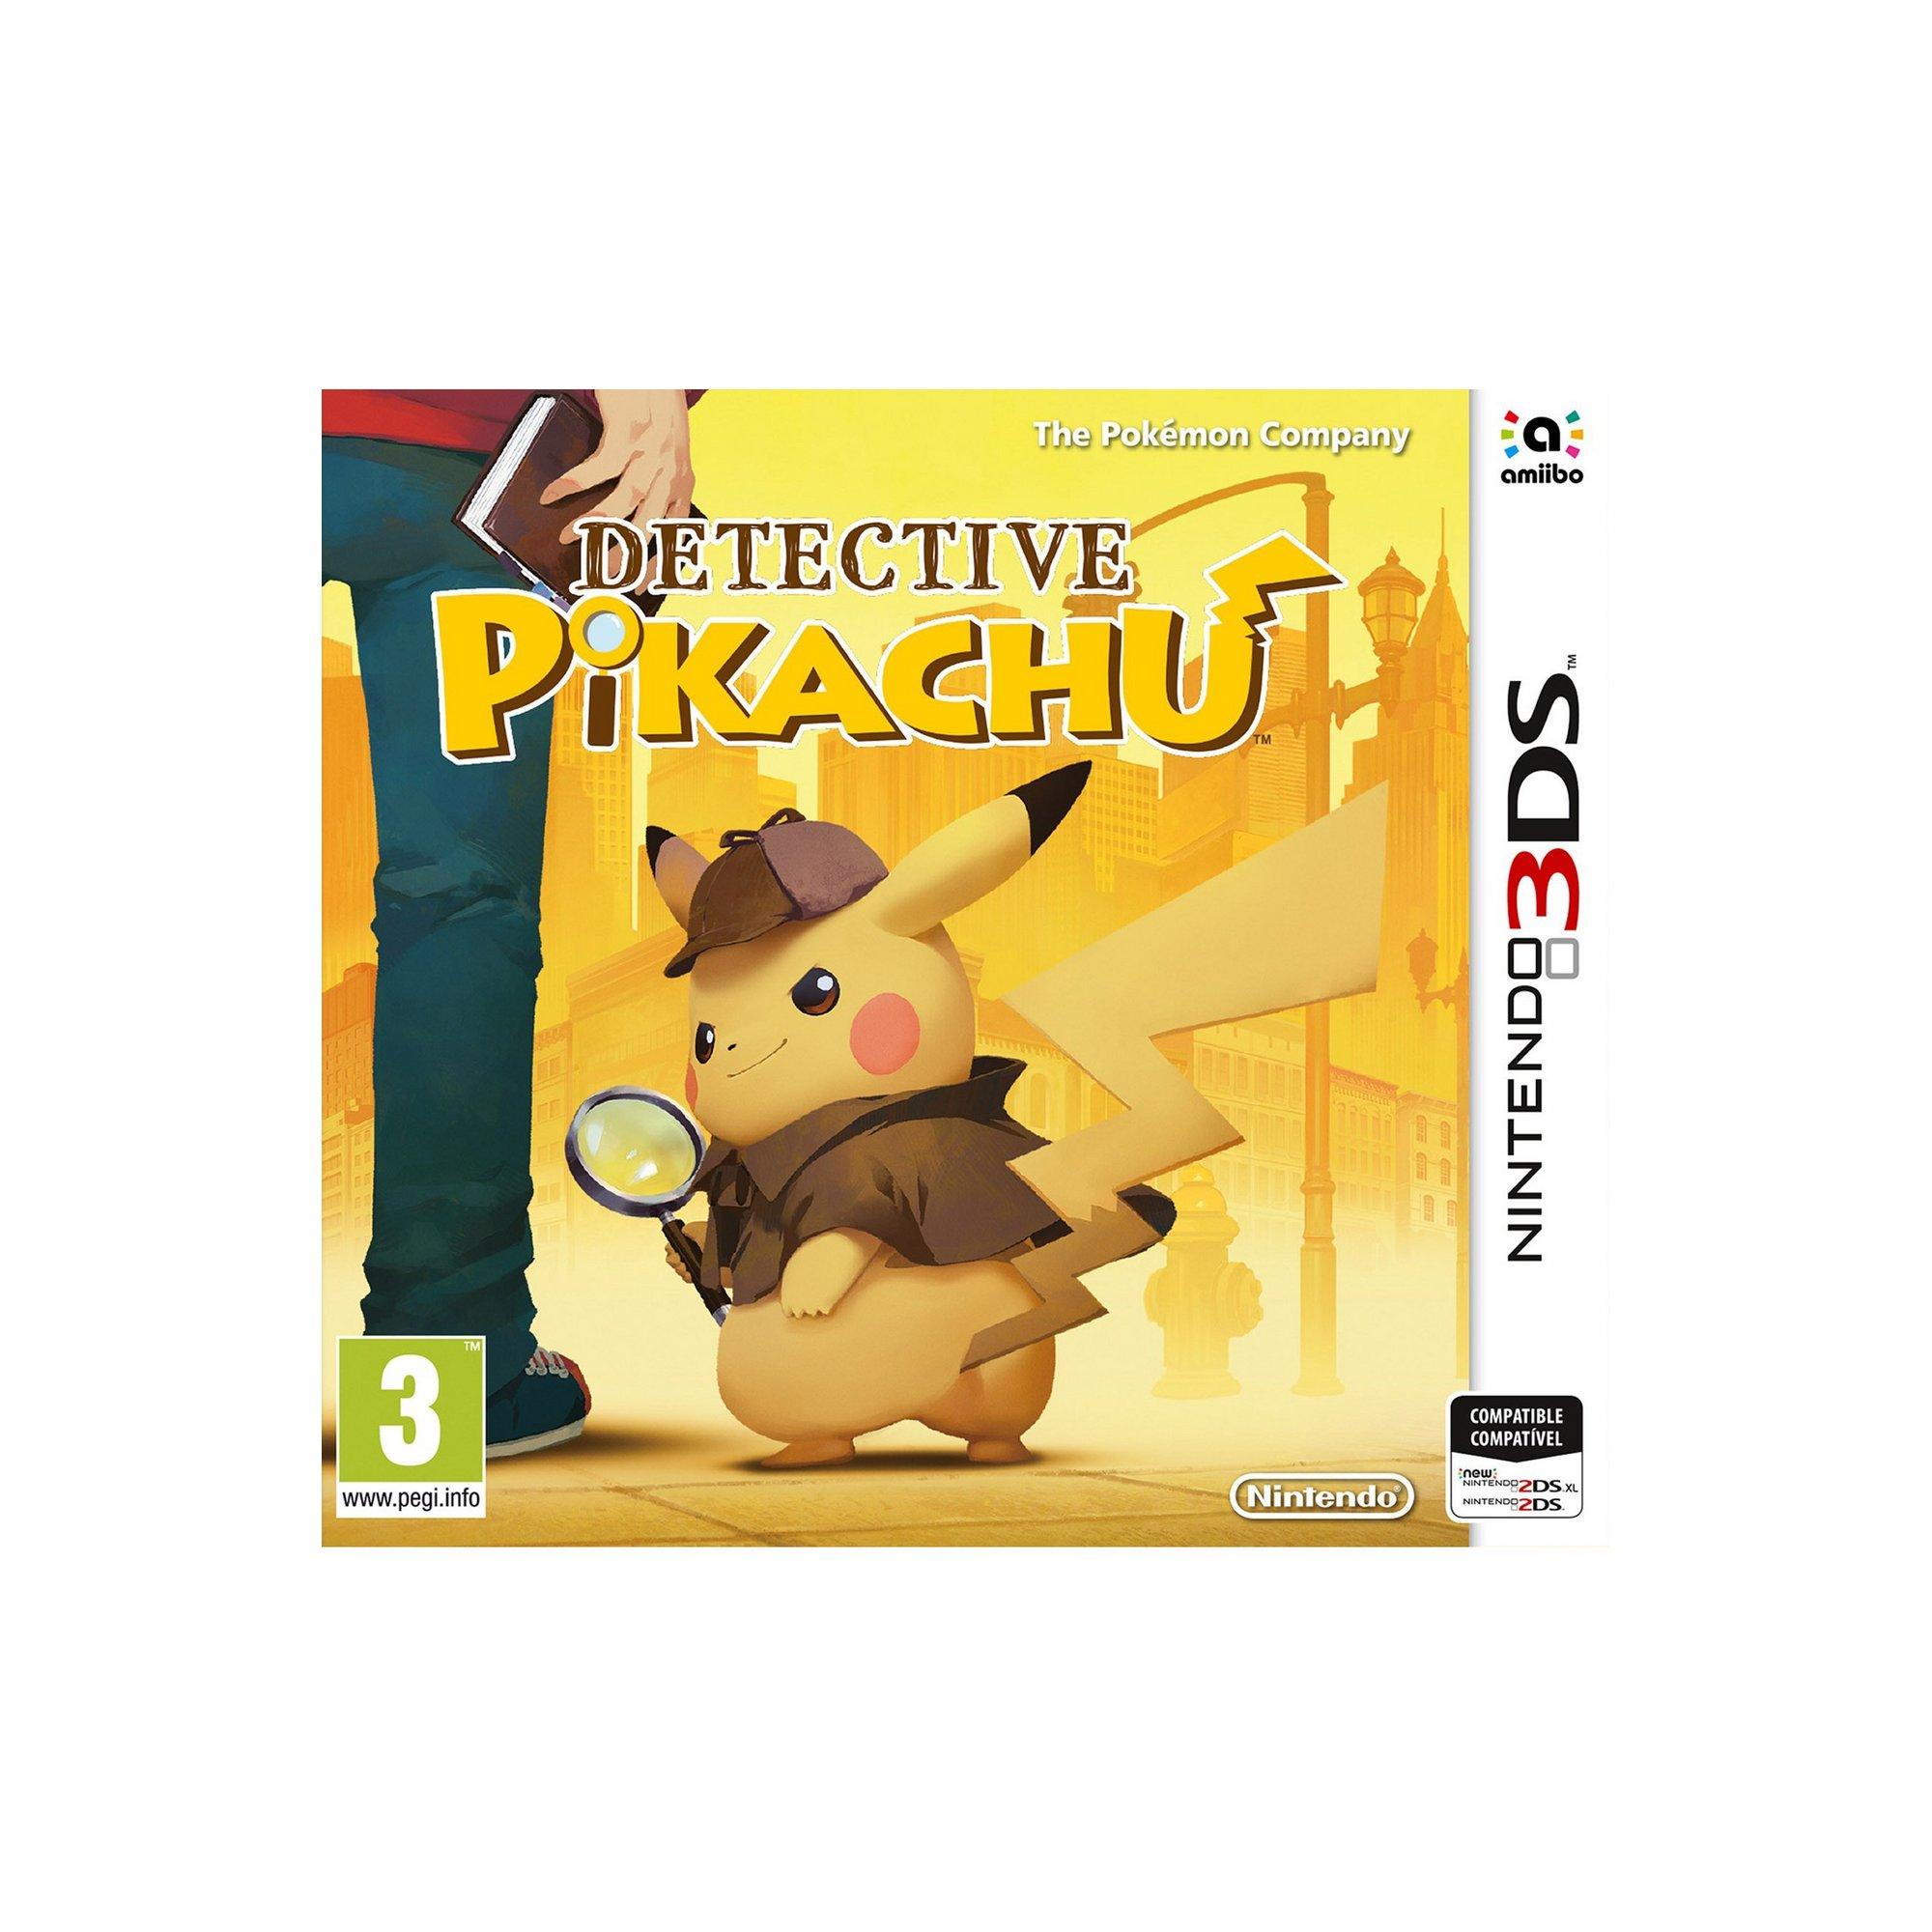 Image of Nintendo 3DS: Detective Pikachu